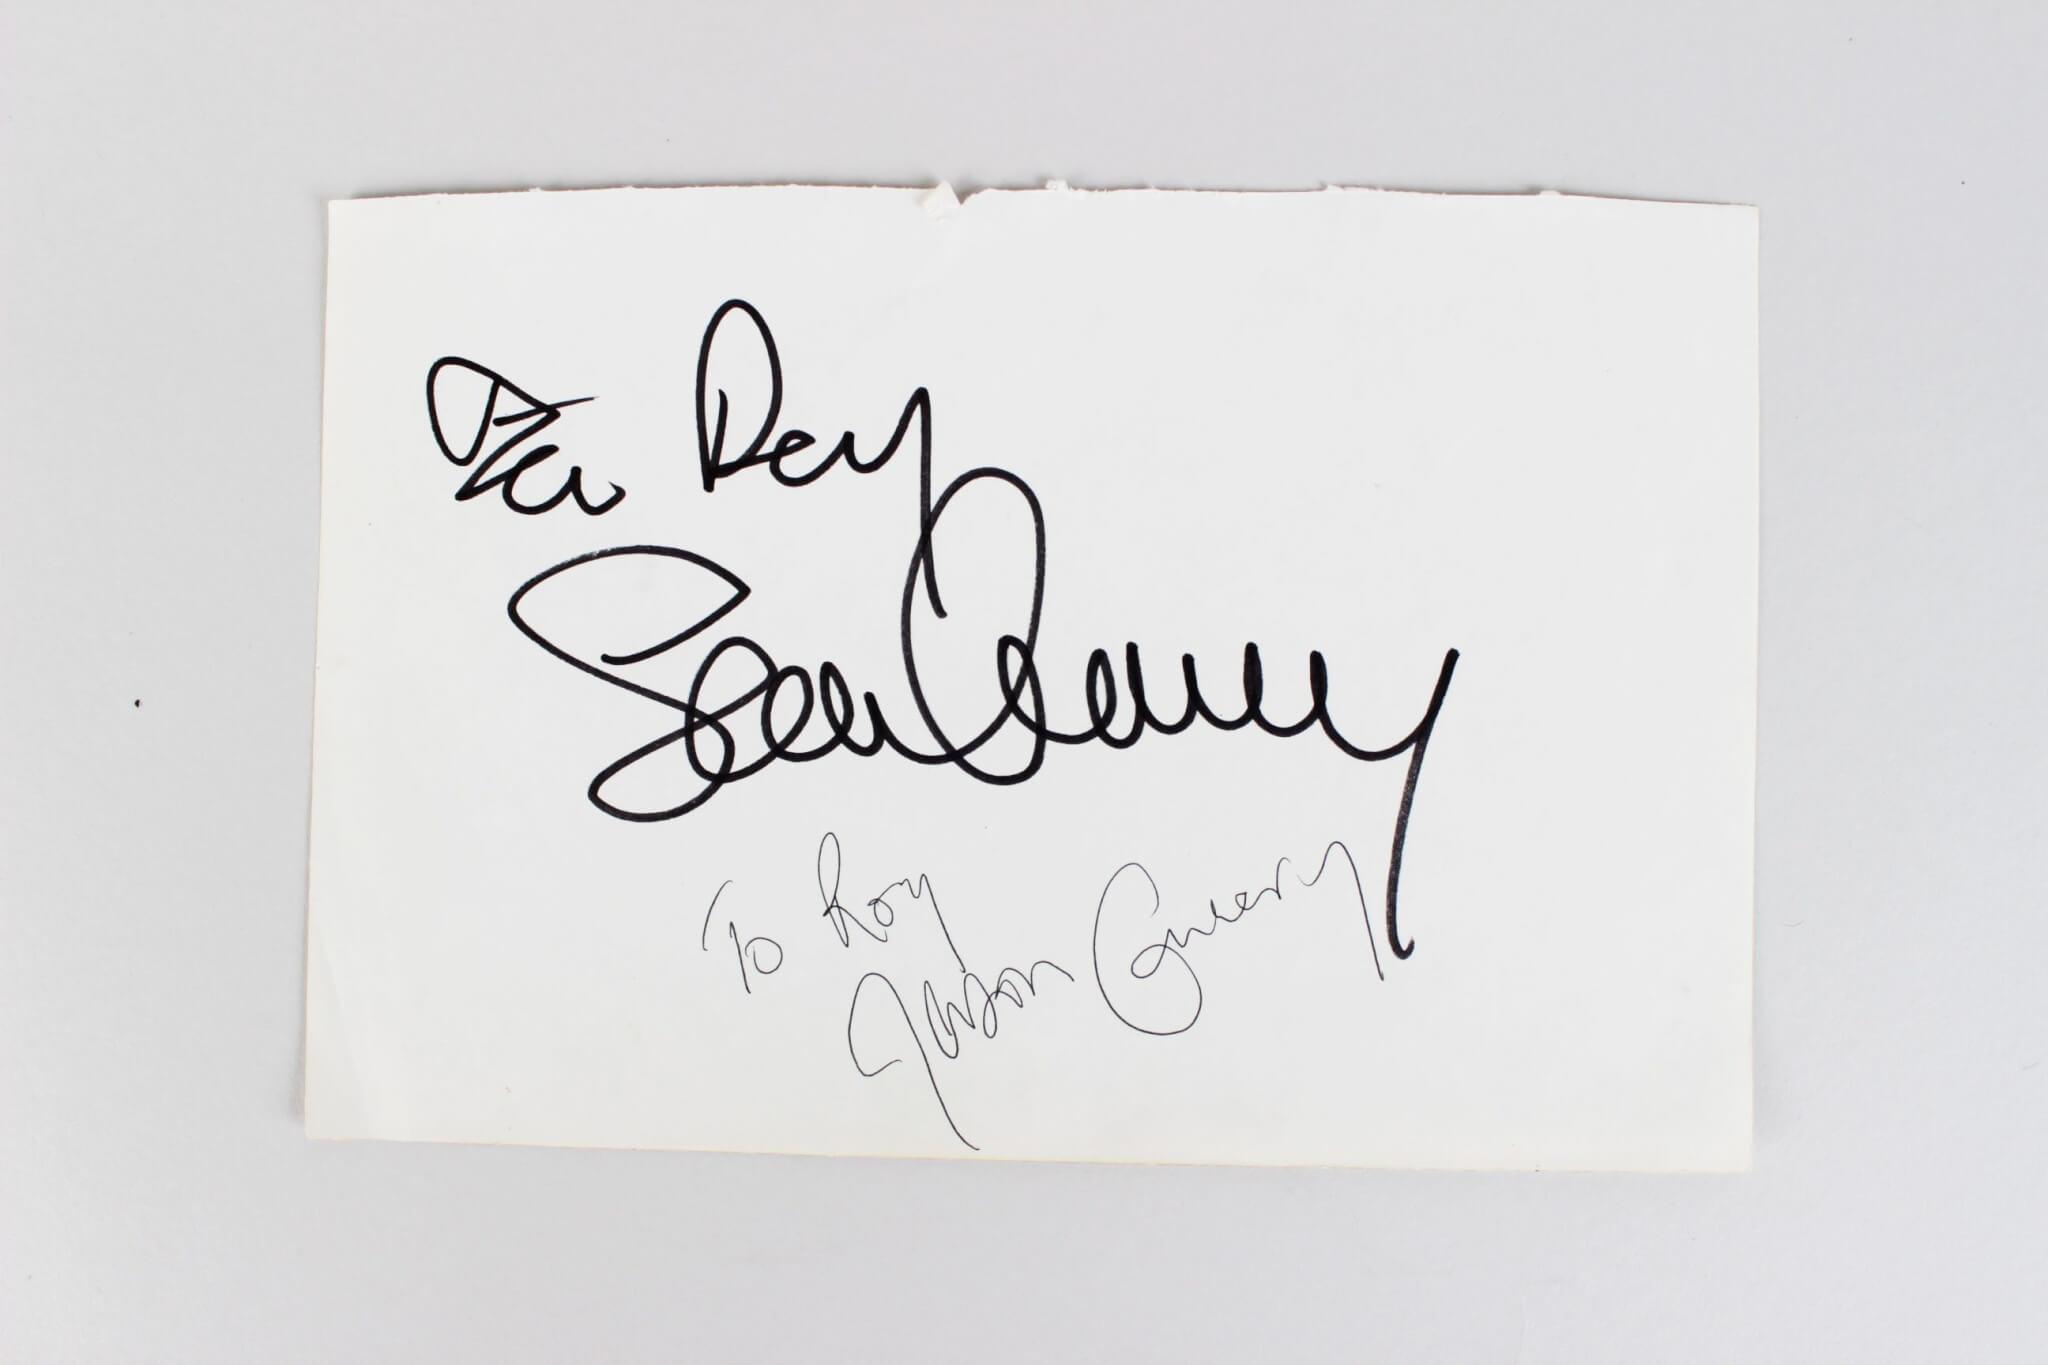 Sean & Jason Connery Signed 5x8 Cut Album Page - JSA Full LOA